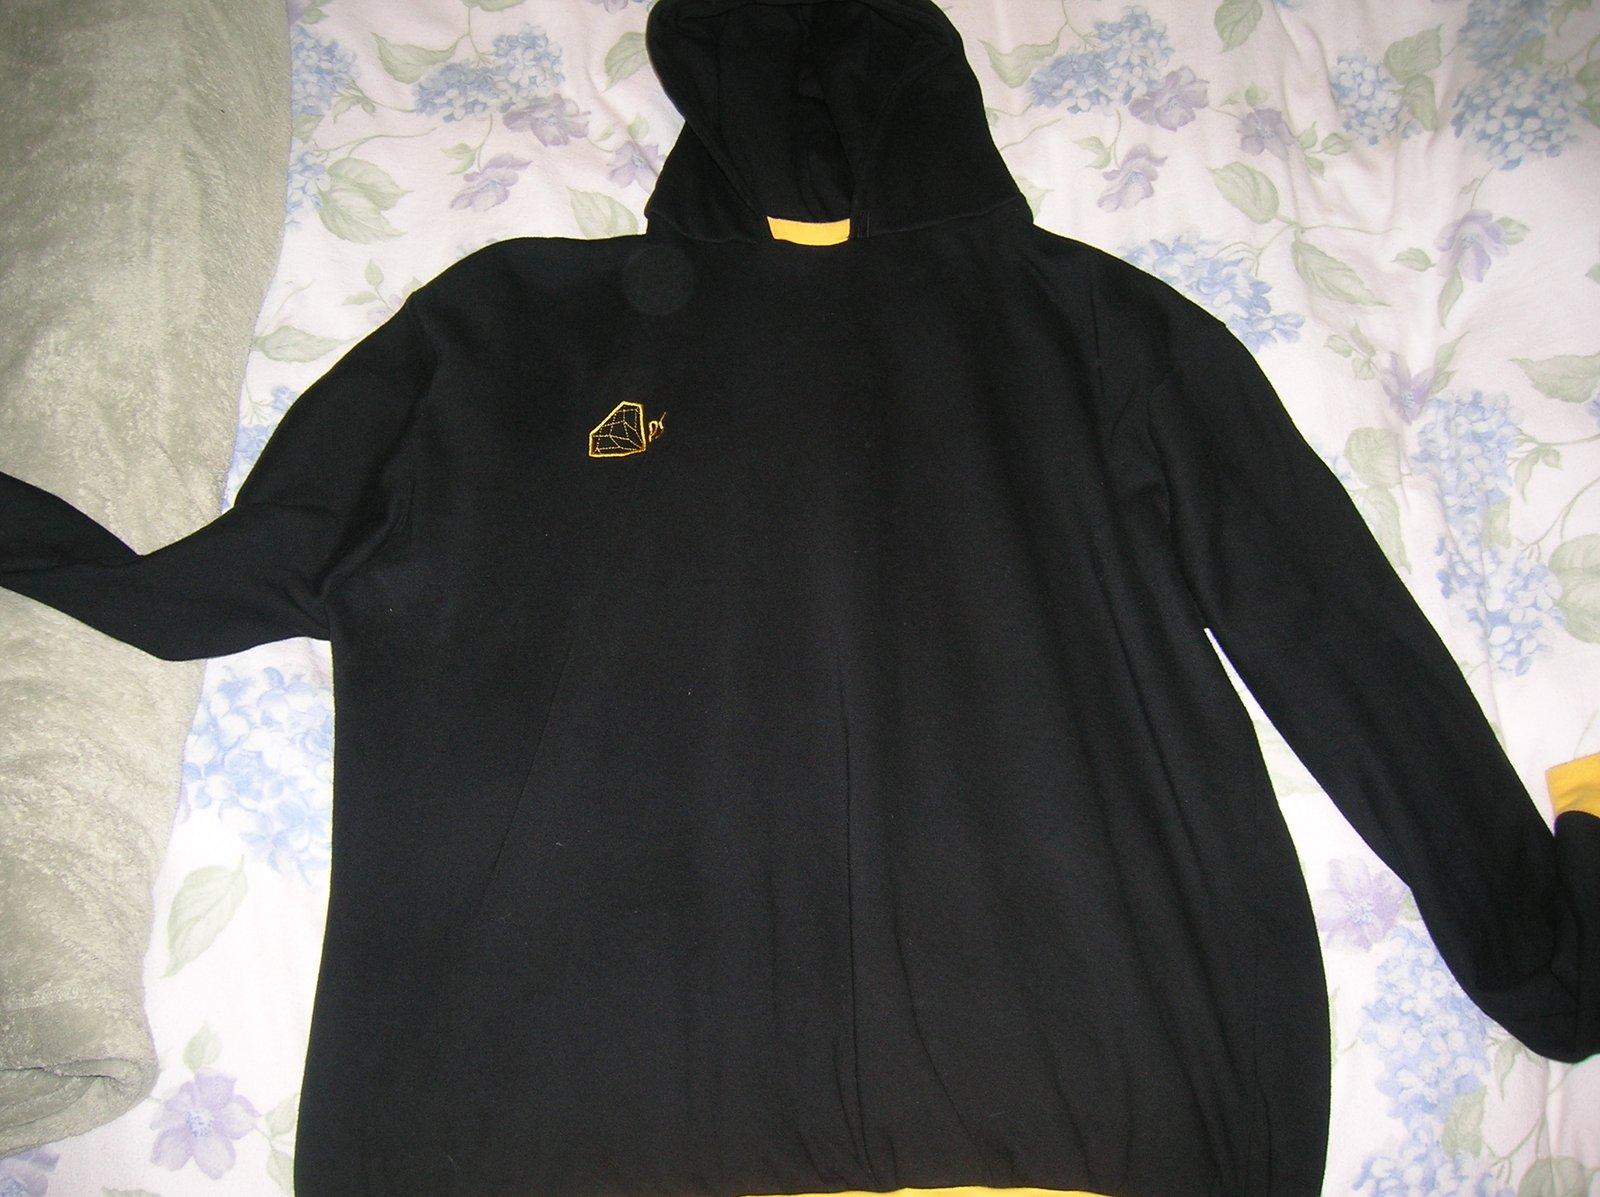 Plenty soul a Wu-Gang hoodie 9.5/10 condition